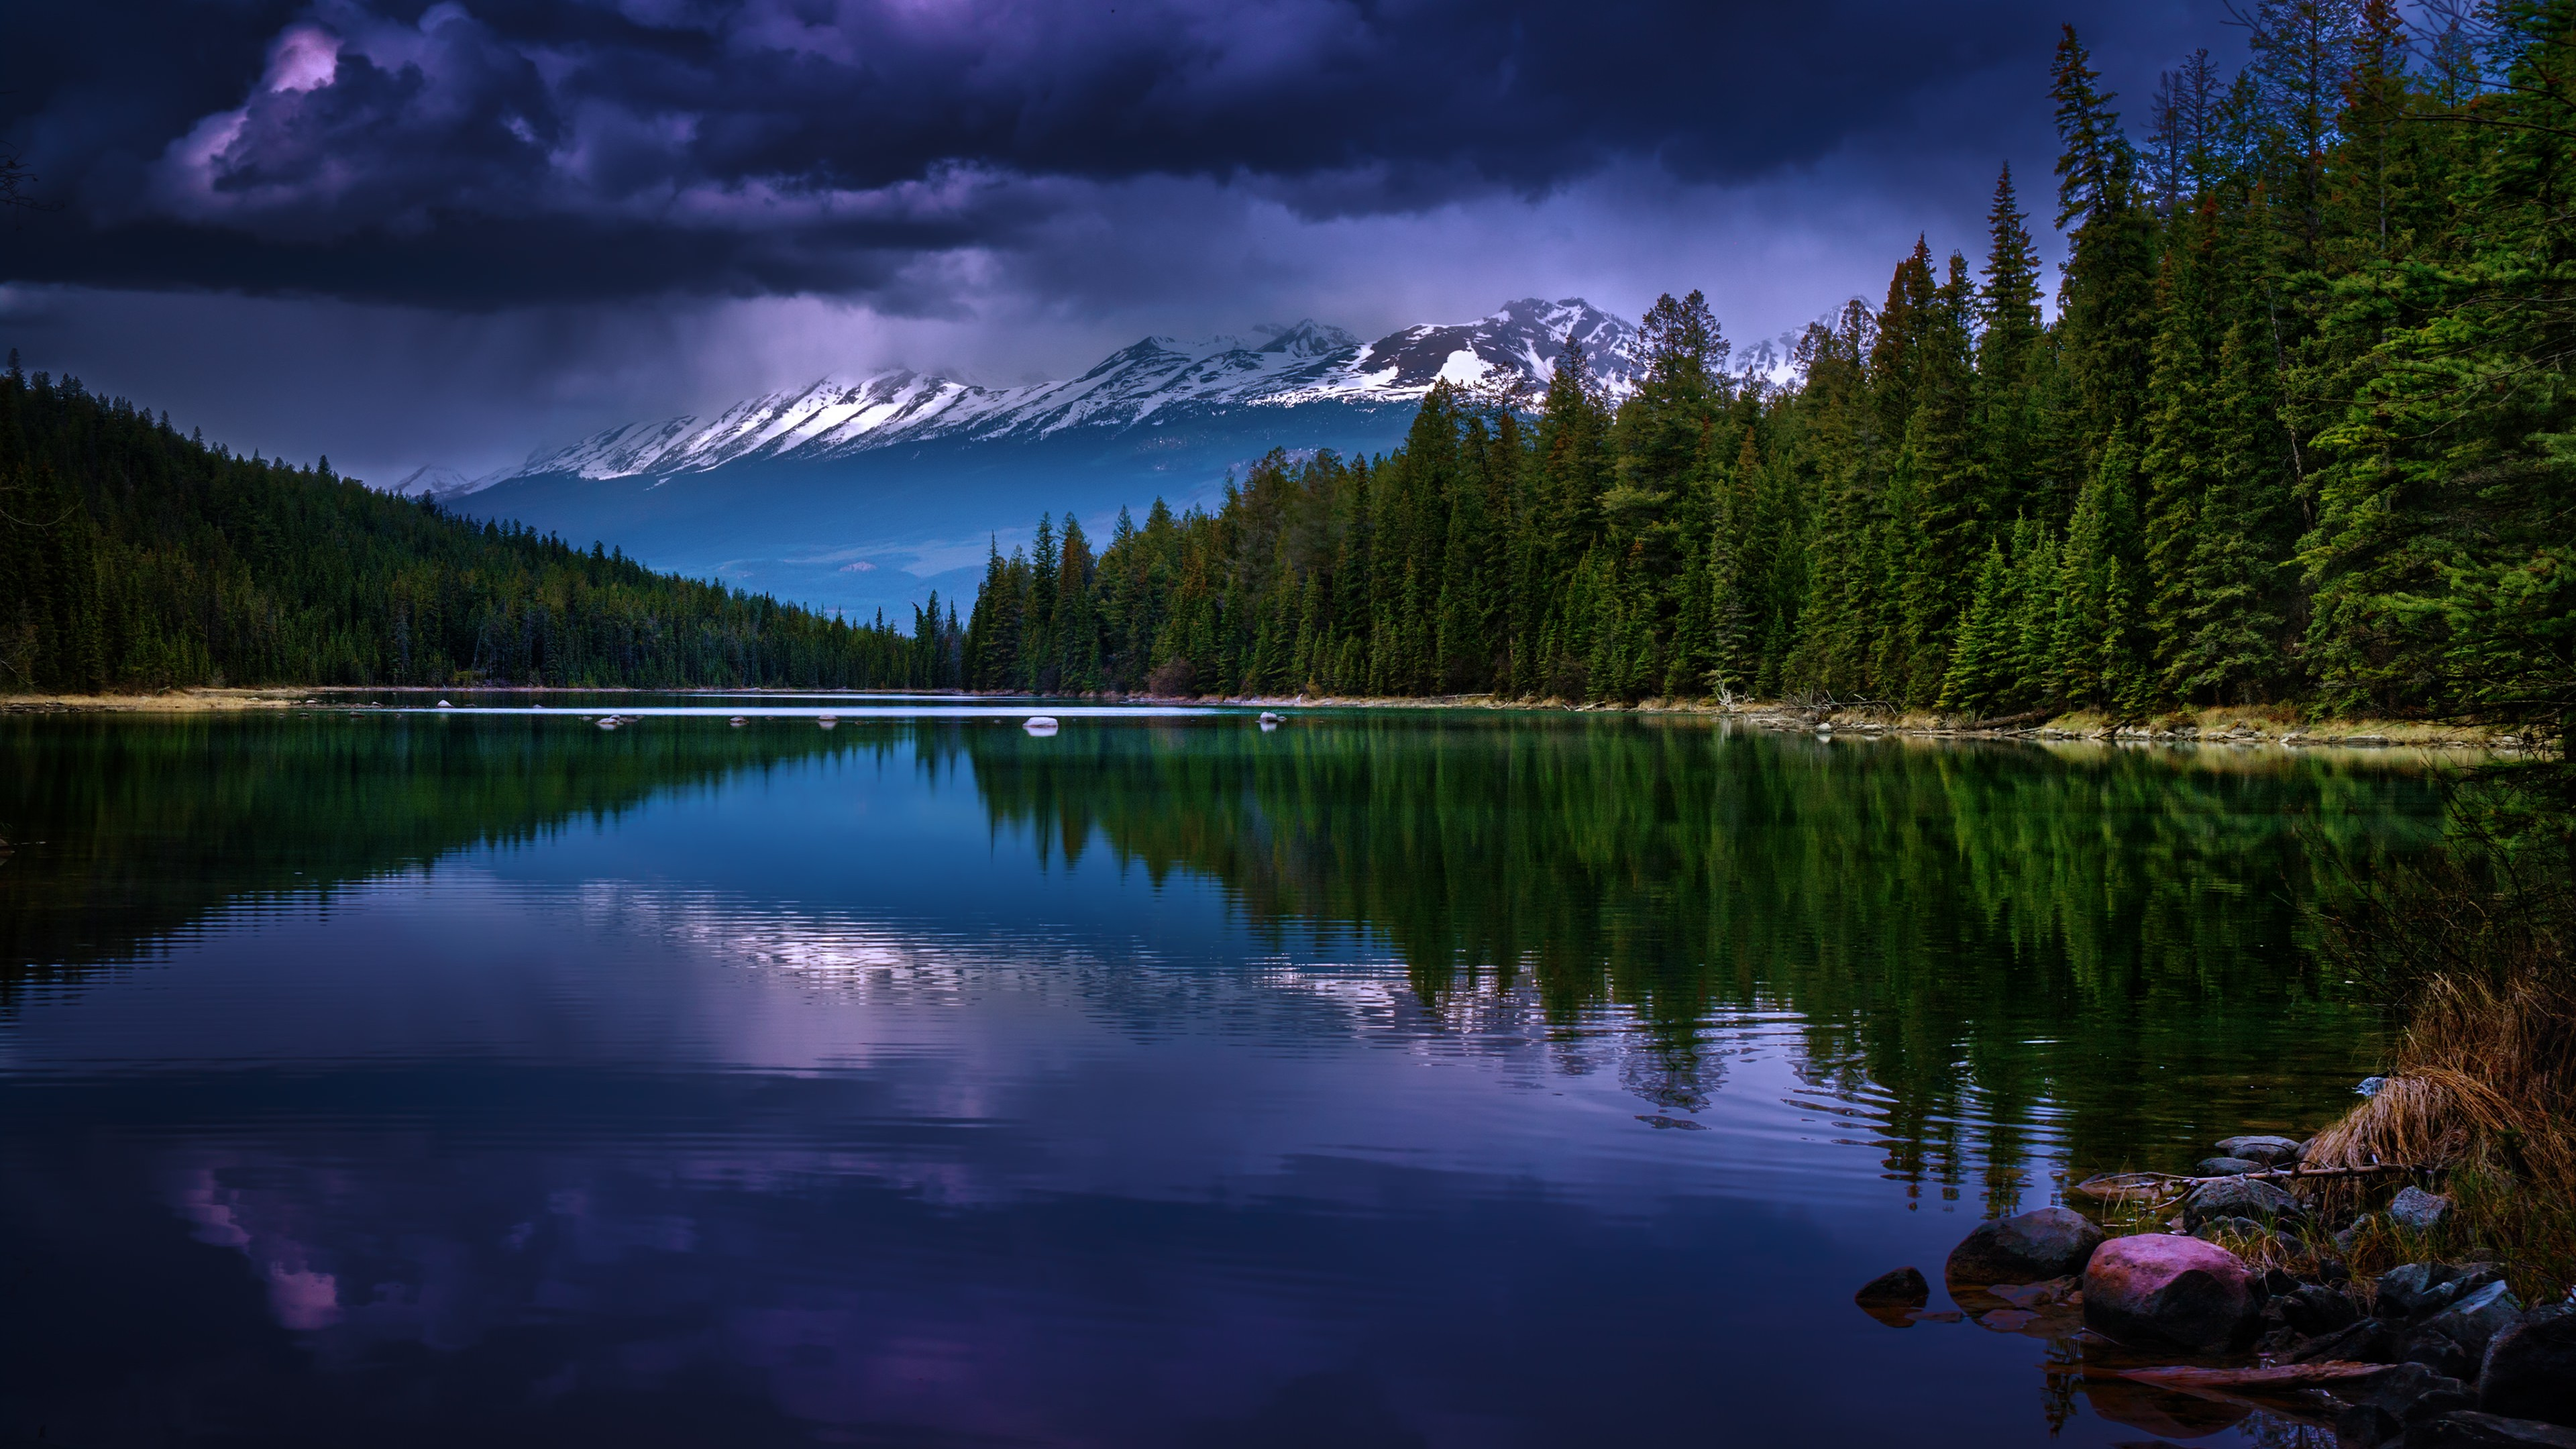 Alberta Canada HD wallpaper for 4K 3840 x 2160   HDwallpapersnet 3840x2160